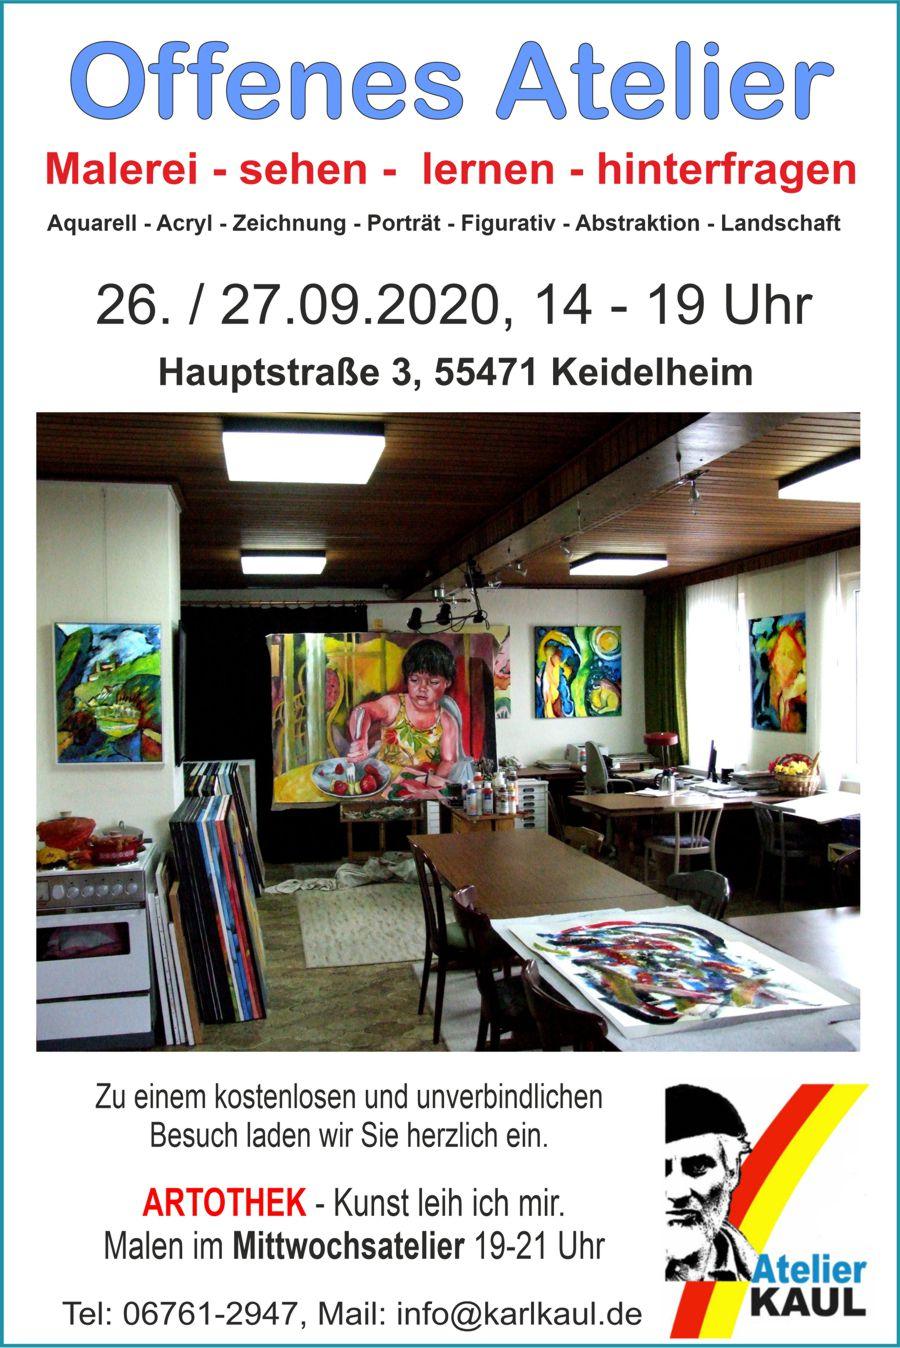 ffenes Atelier 2020 Karl Kaul